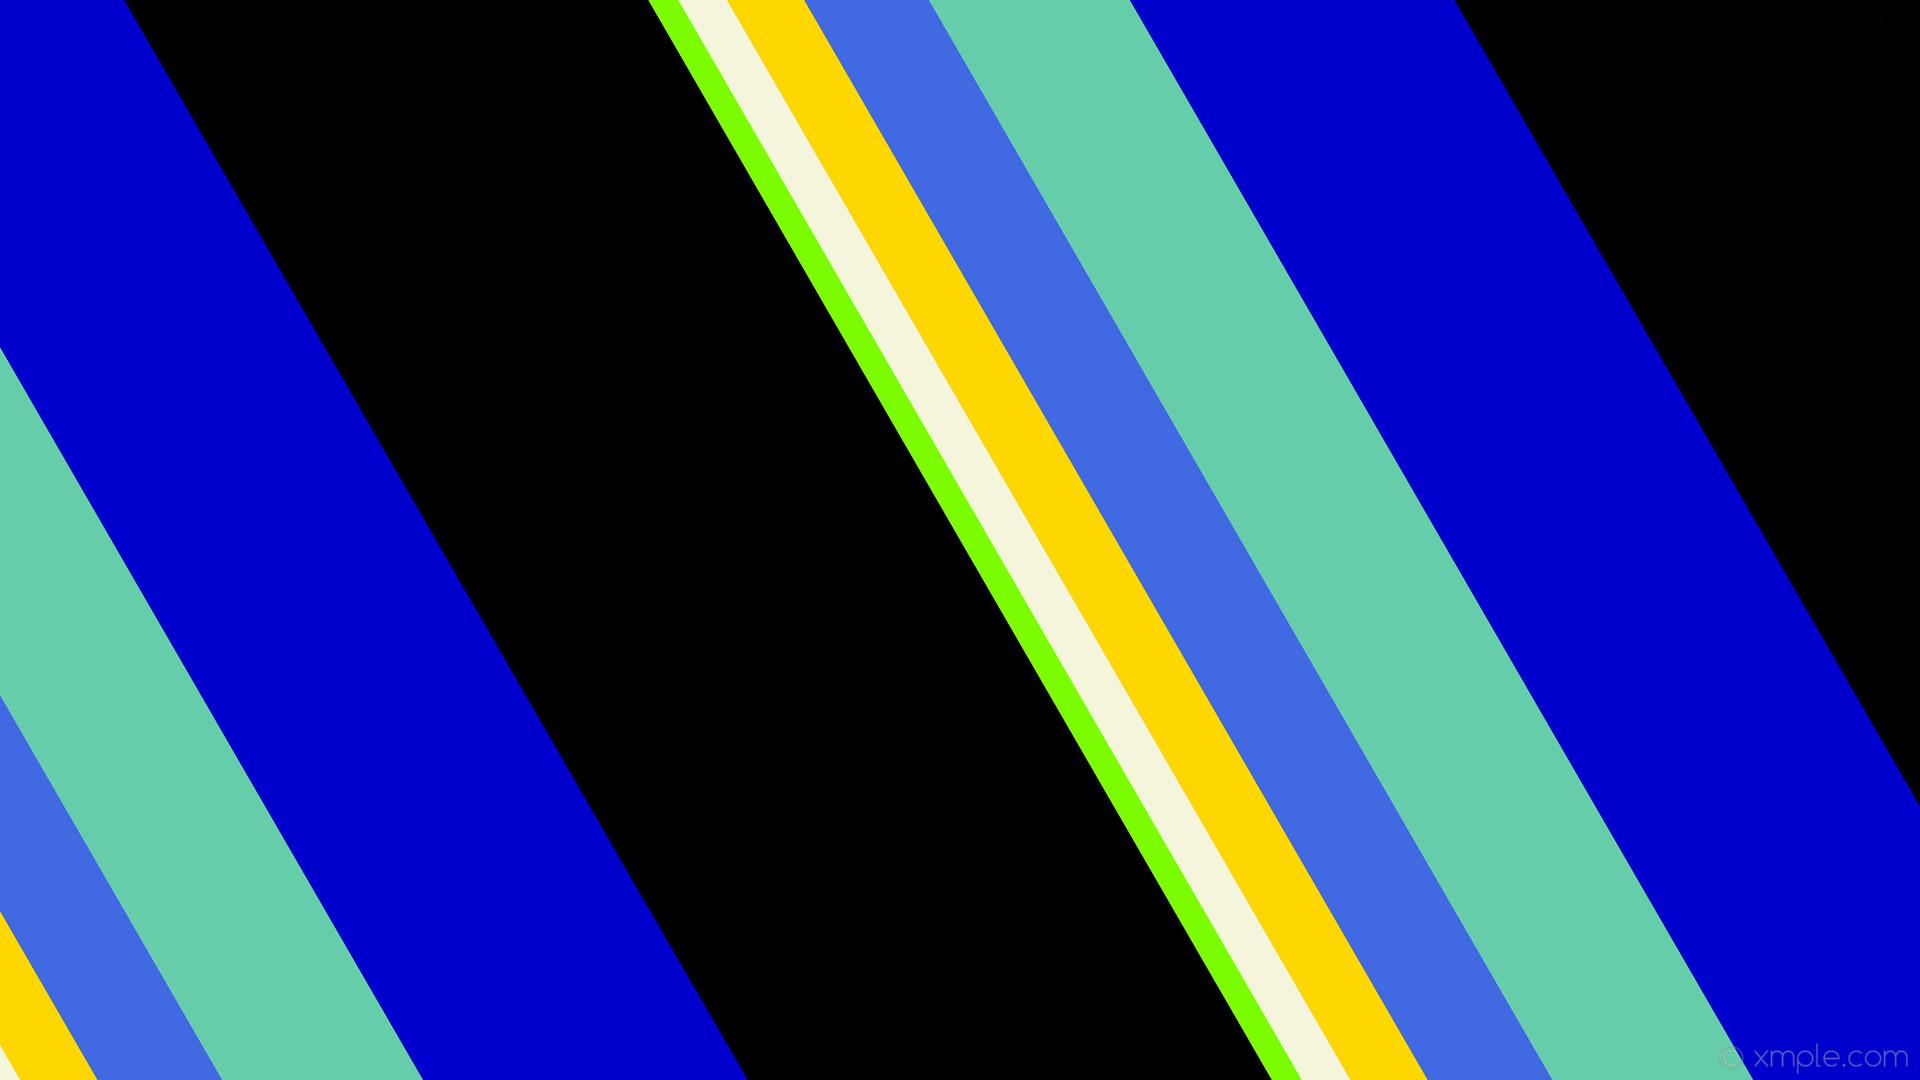 wallpaper green streaks black stripes yellow blue lines white lawn green  beige gold royal blue medium